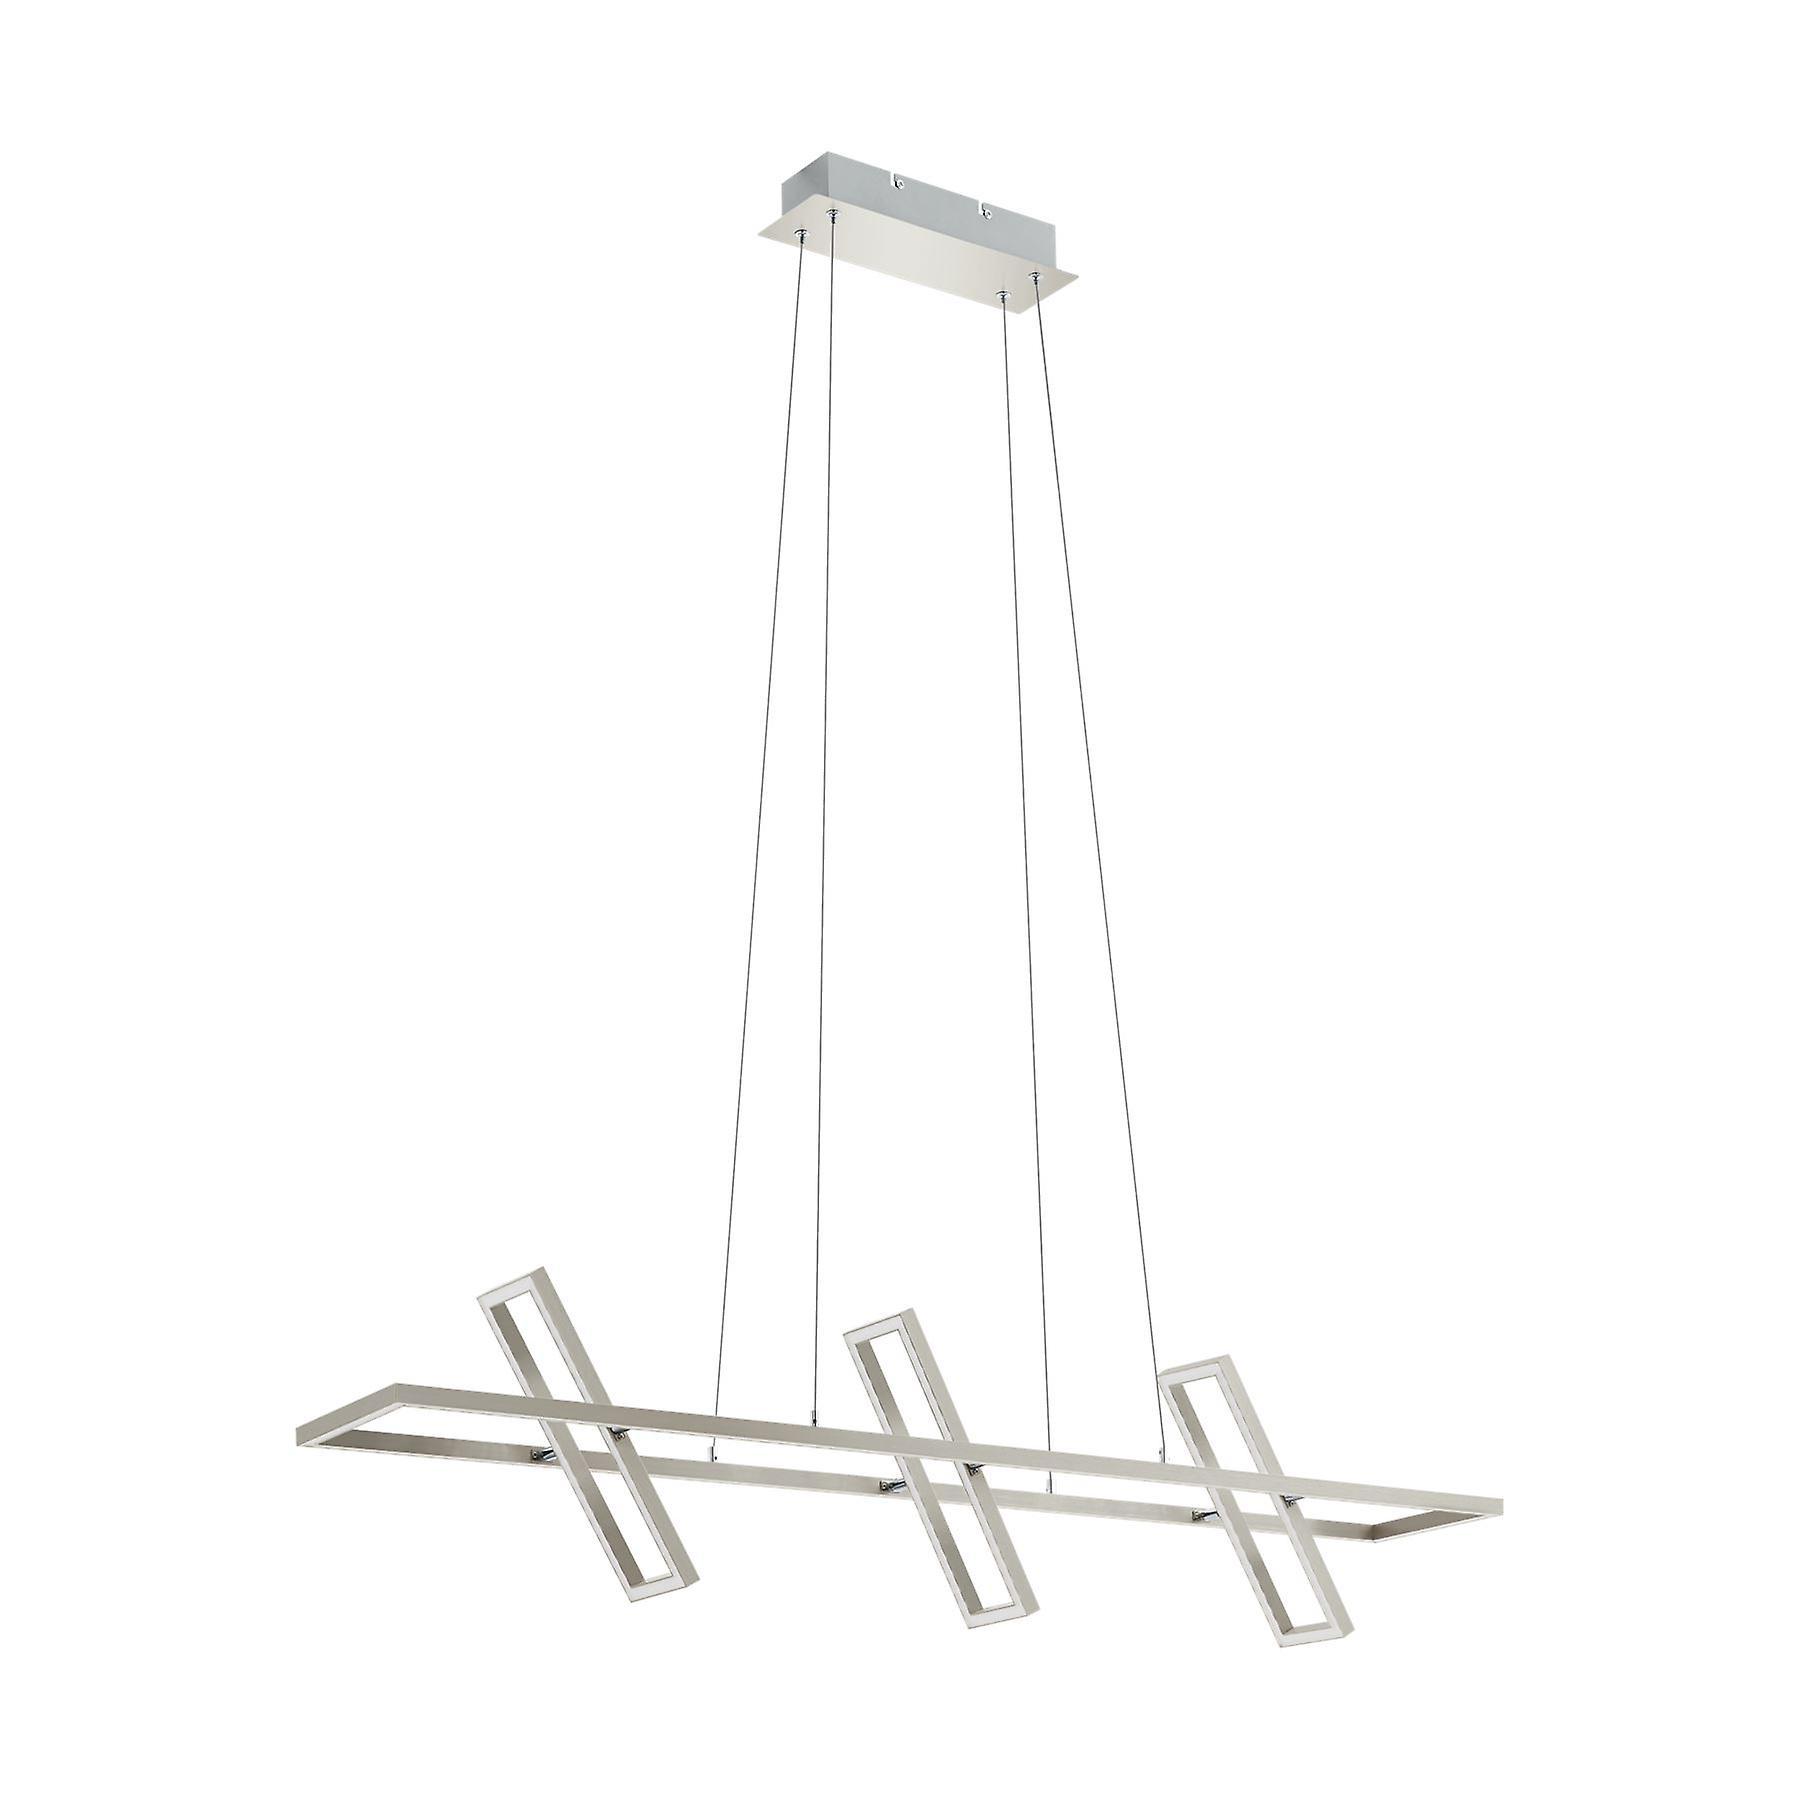 Eglo - Tamasara LED Large Rectangular Ceiling Pendant In Satin Nickel And blanc Finish EG96816